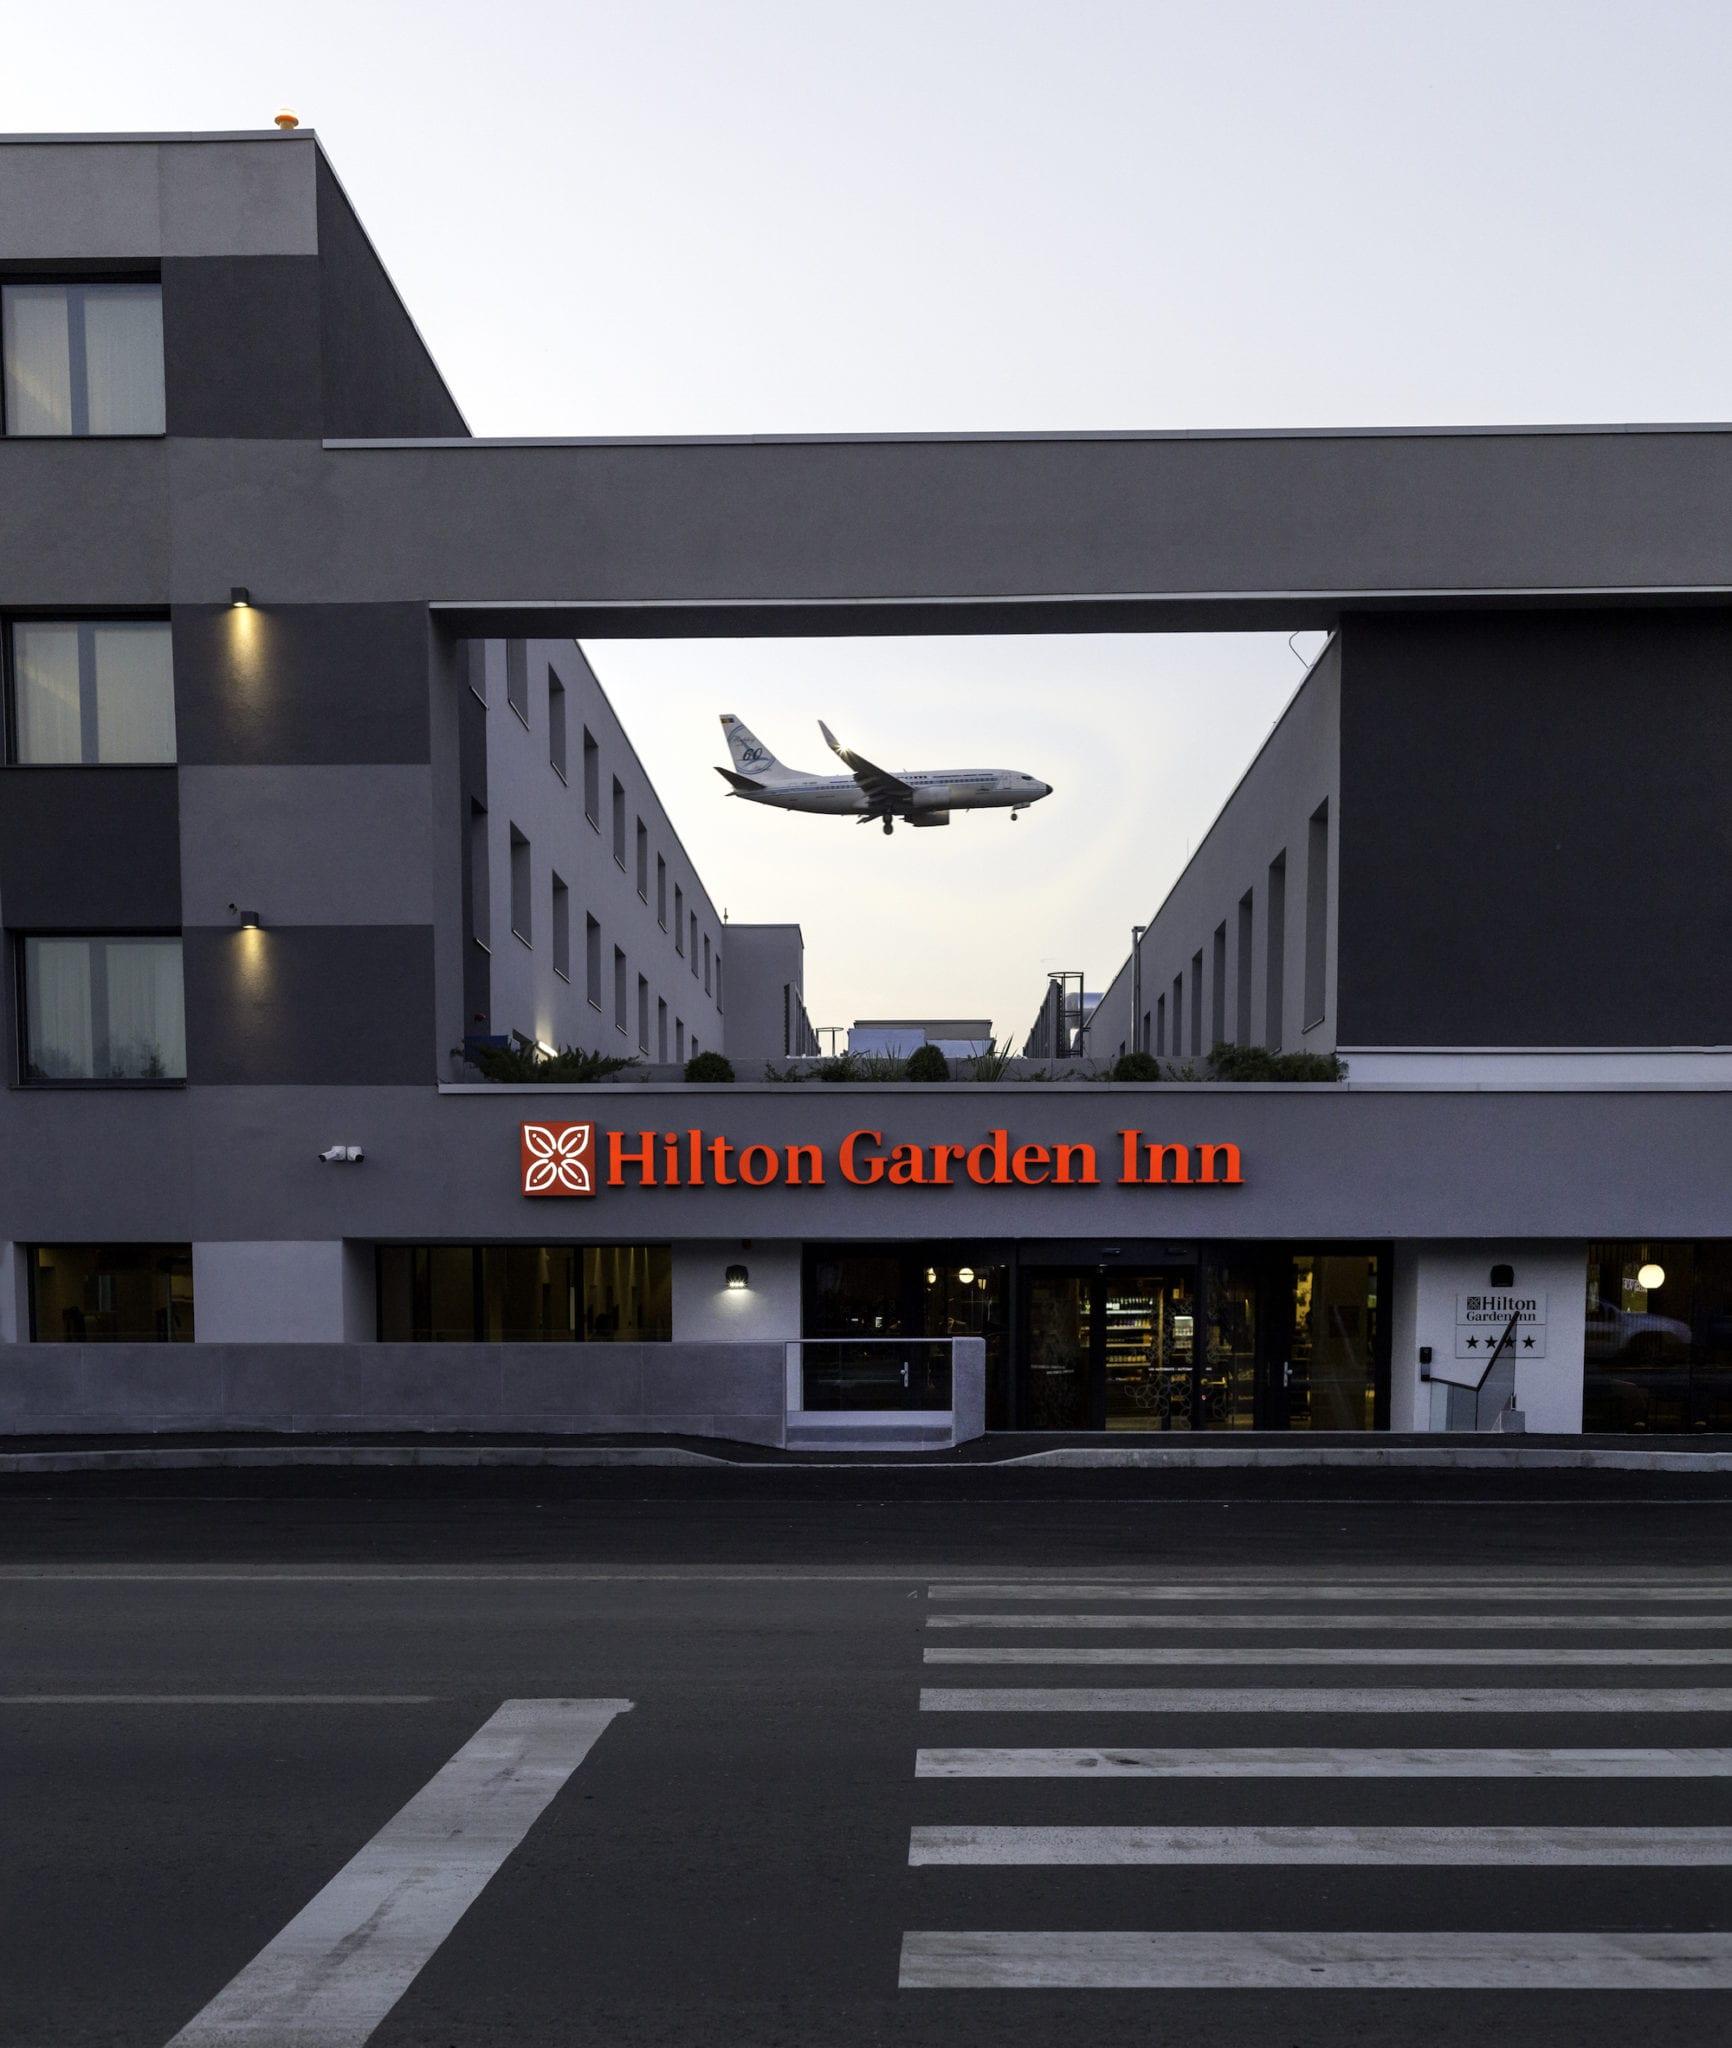 Hilton Garden Inn Airport2 - Apex deschide Hilton Garden Inn în Aeroportul Internațional Henri Coandă